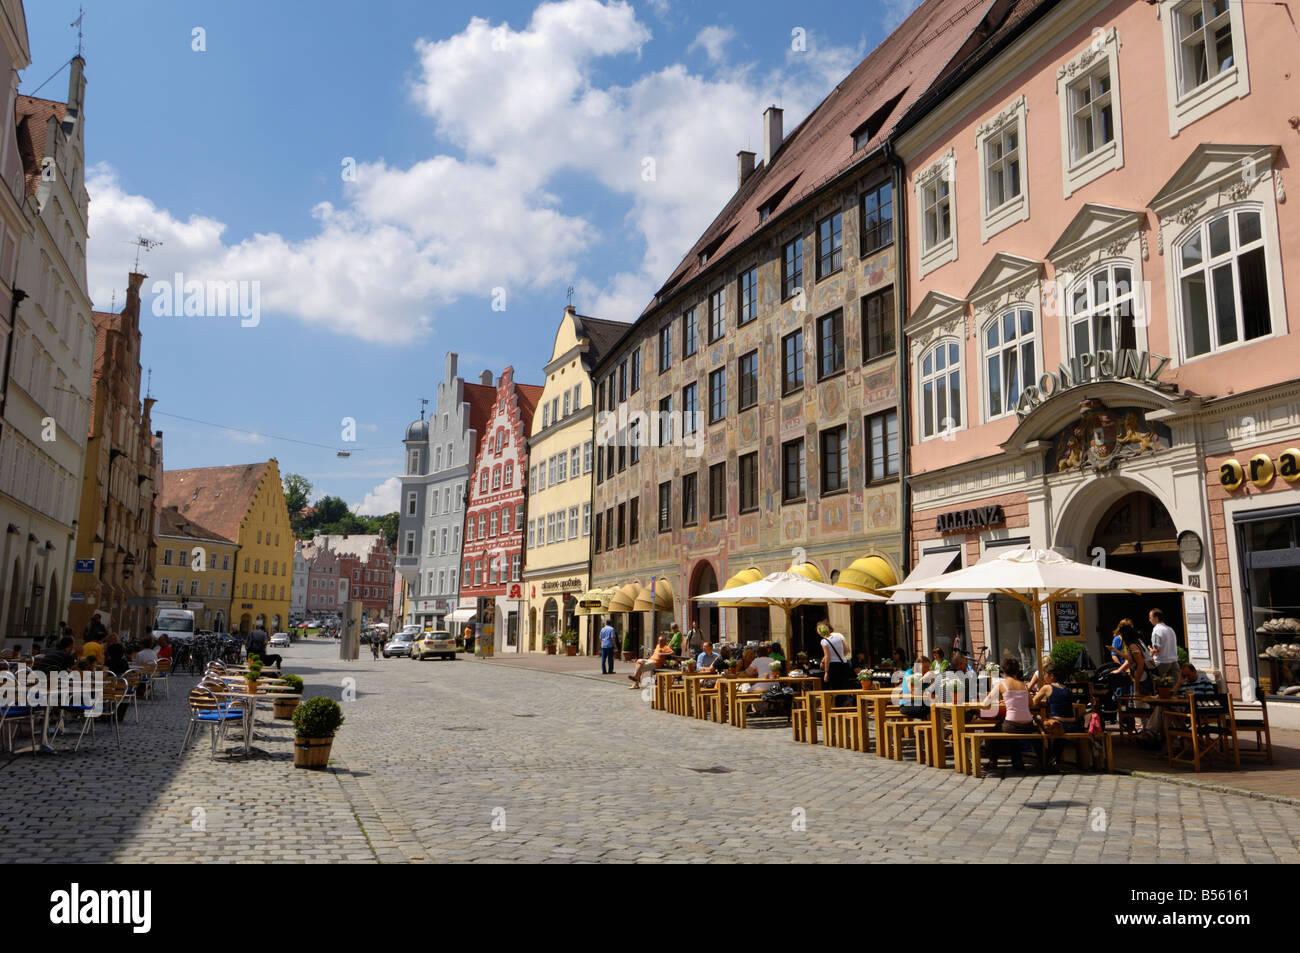 Altstadt, Landshut, Bavaria, Germany - Stock Image